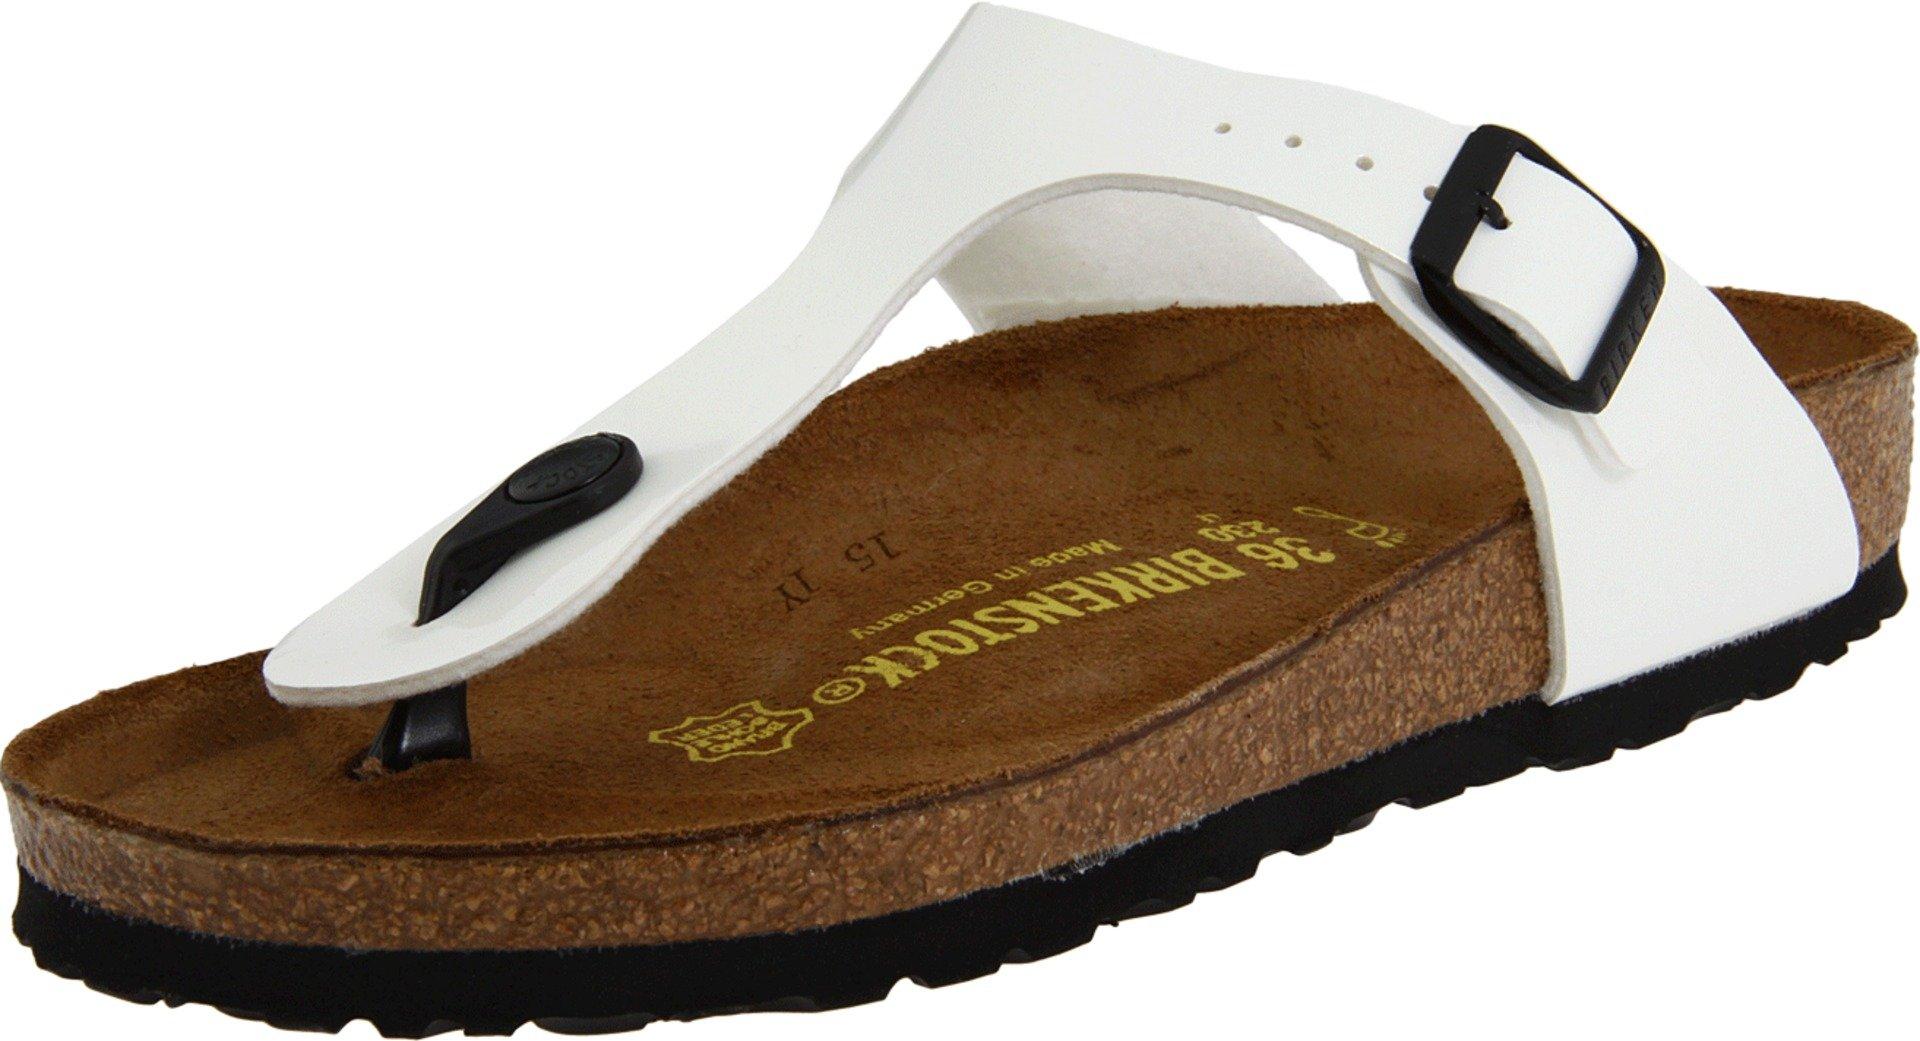 Birkenstock Women's Gizeh Bright White Patent Birko-Flor Sandals 40 R (US Women's 9-9.5)